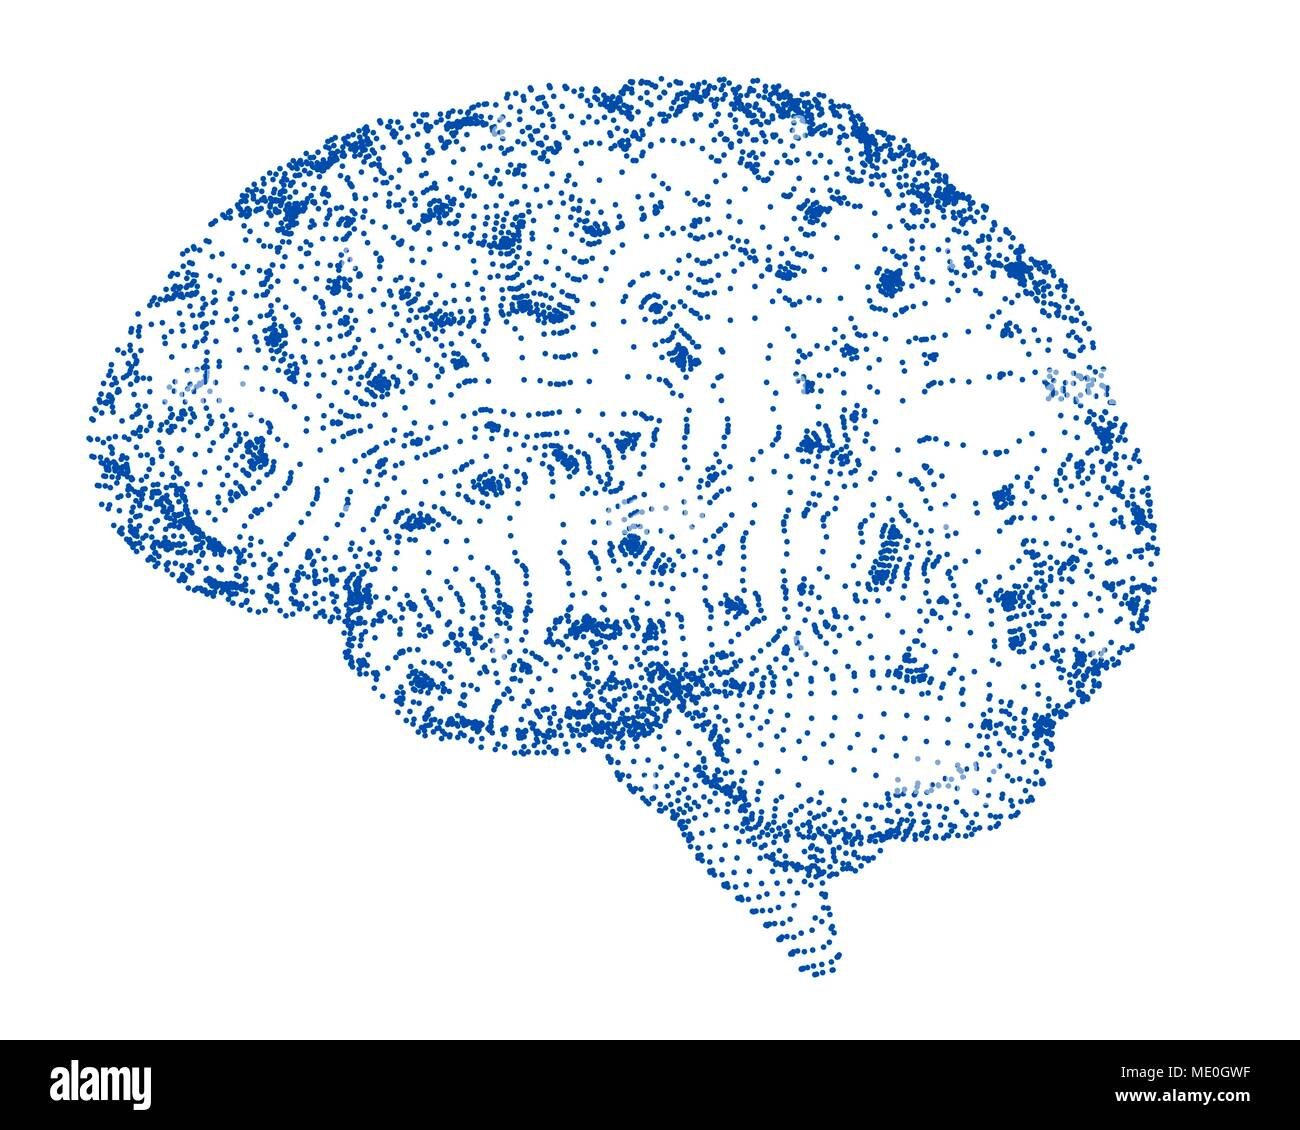 Cerebral Hemisphere Stockfotos & Cerebral Hemisphere Bilder - Seite ...